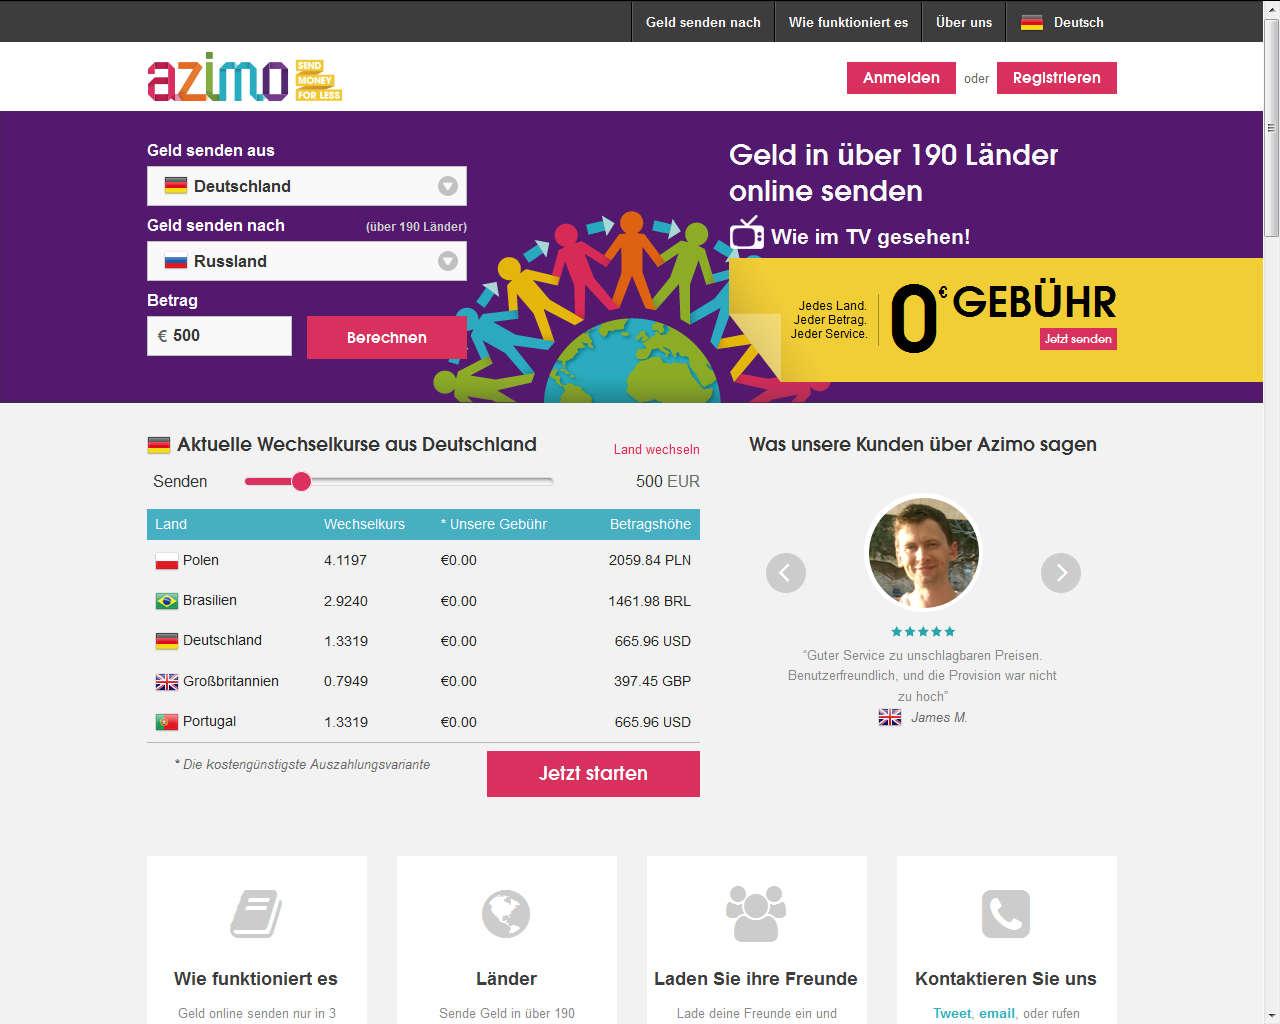 Azimo_webpage.jpg